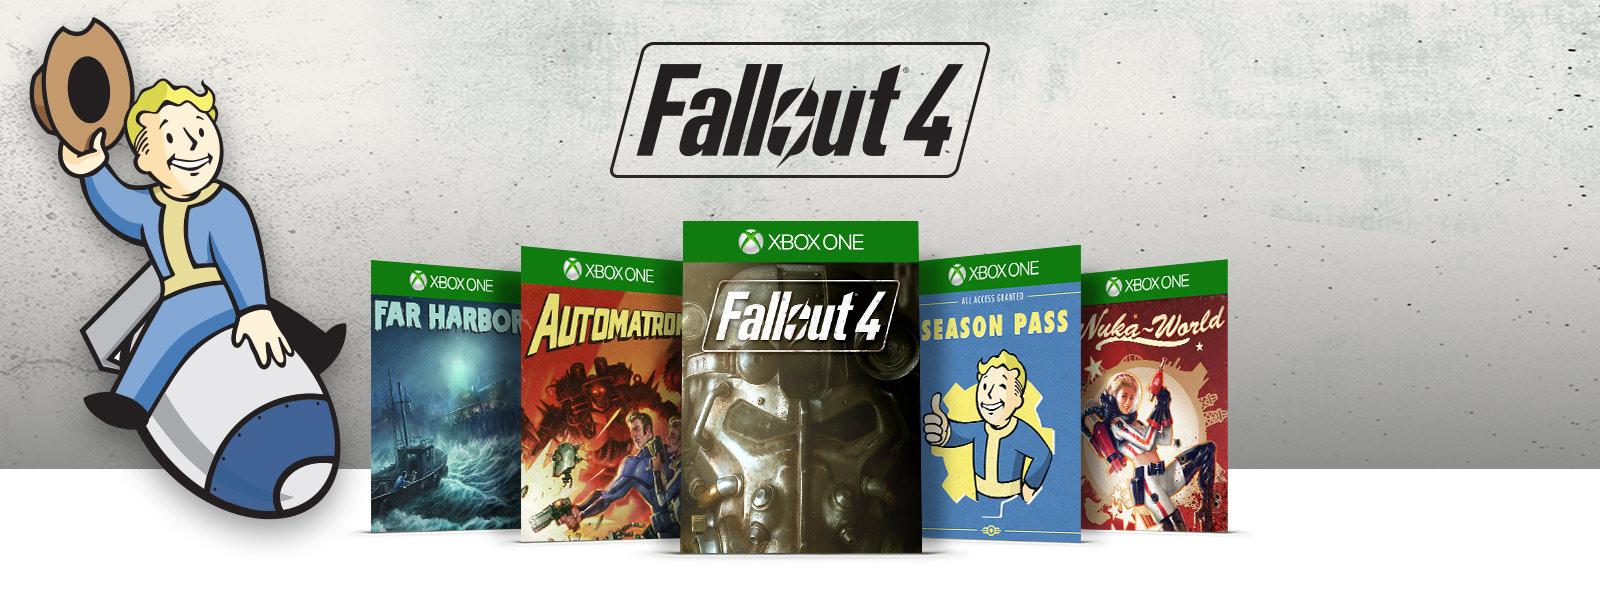 Fallout 4 logo above Far Harbor, Automatron, Fallout 4, Season Pass and Nuka World boxshots